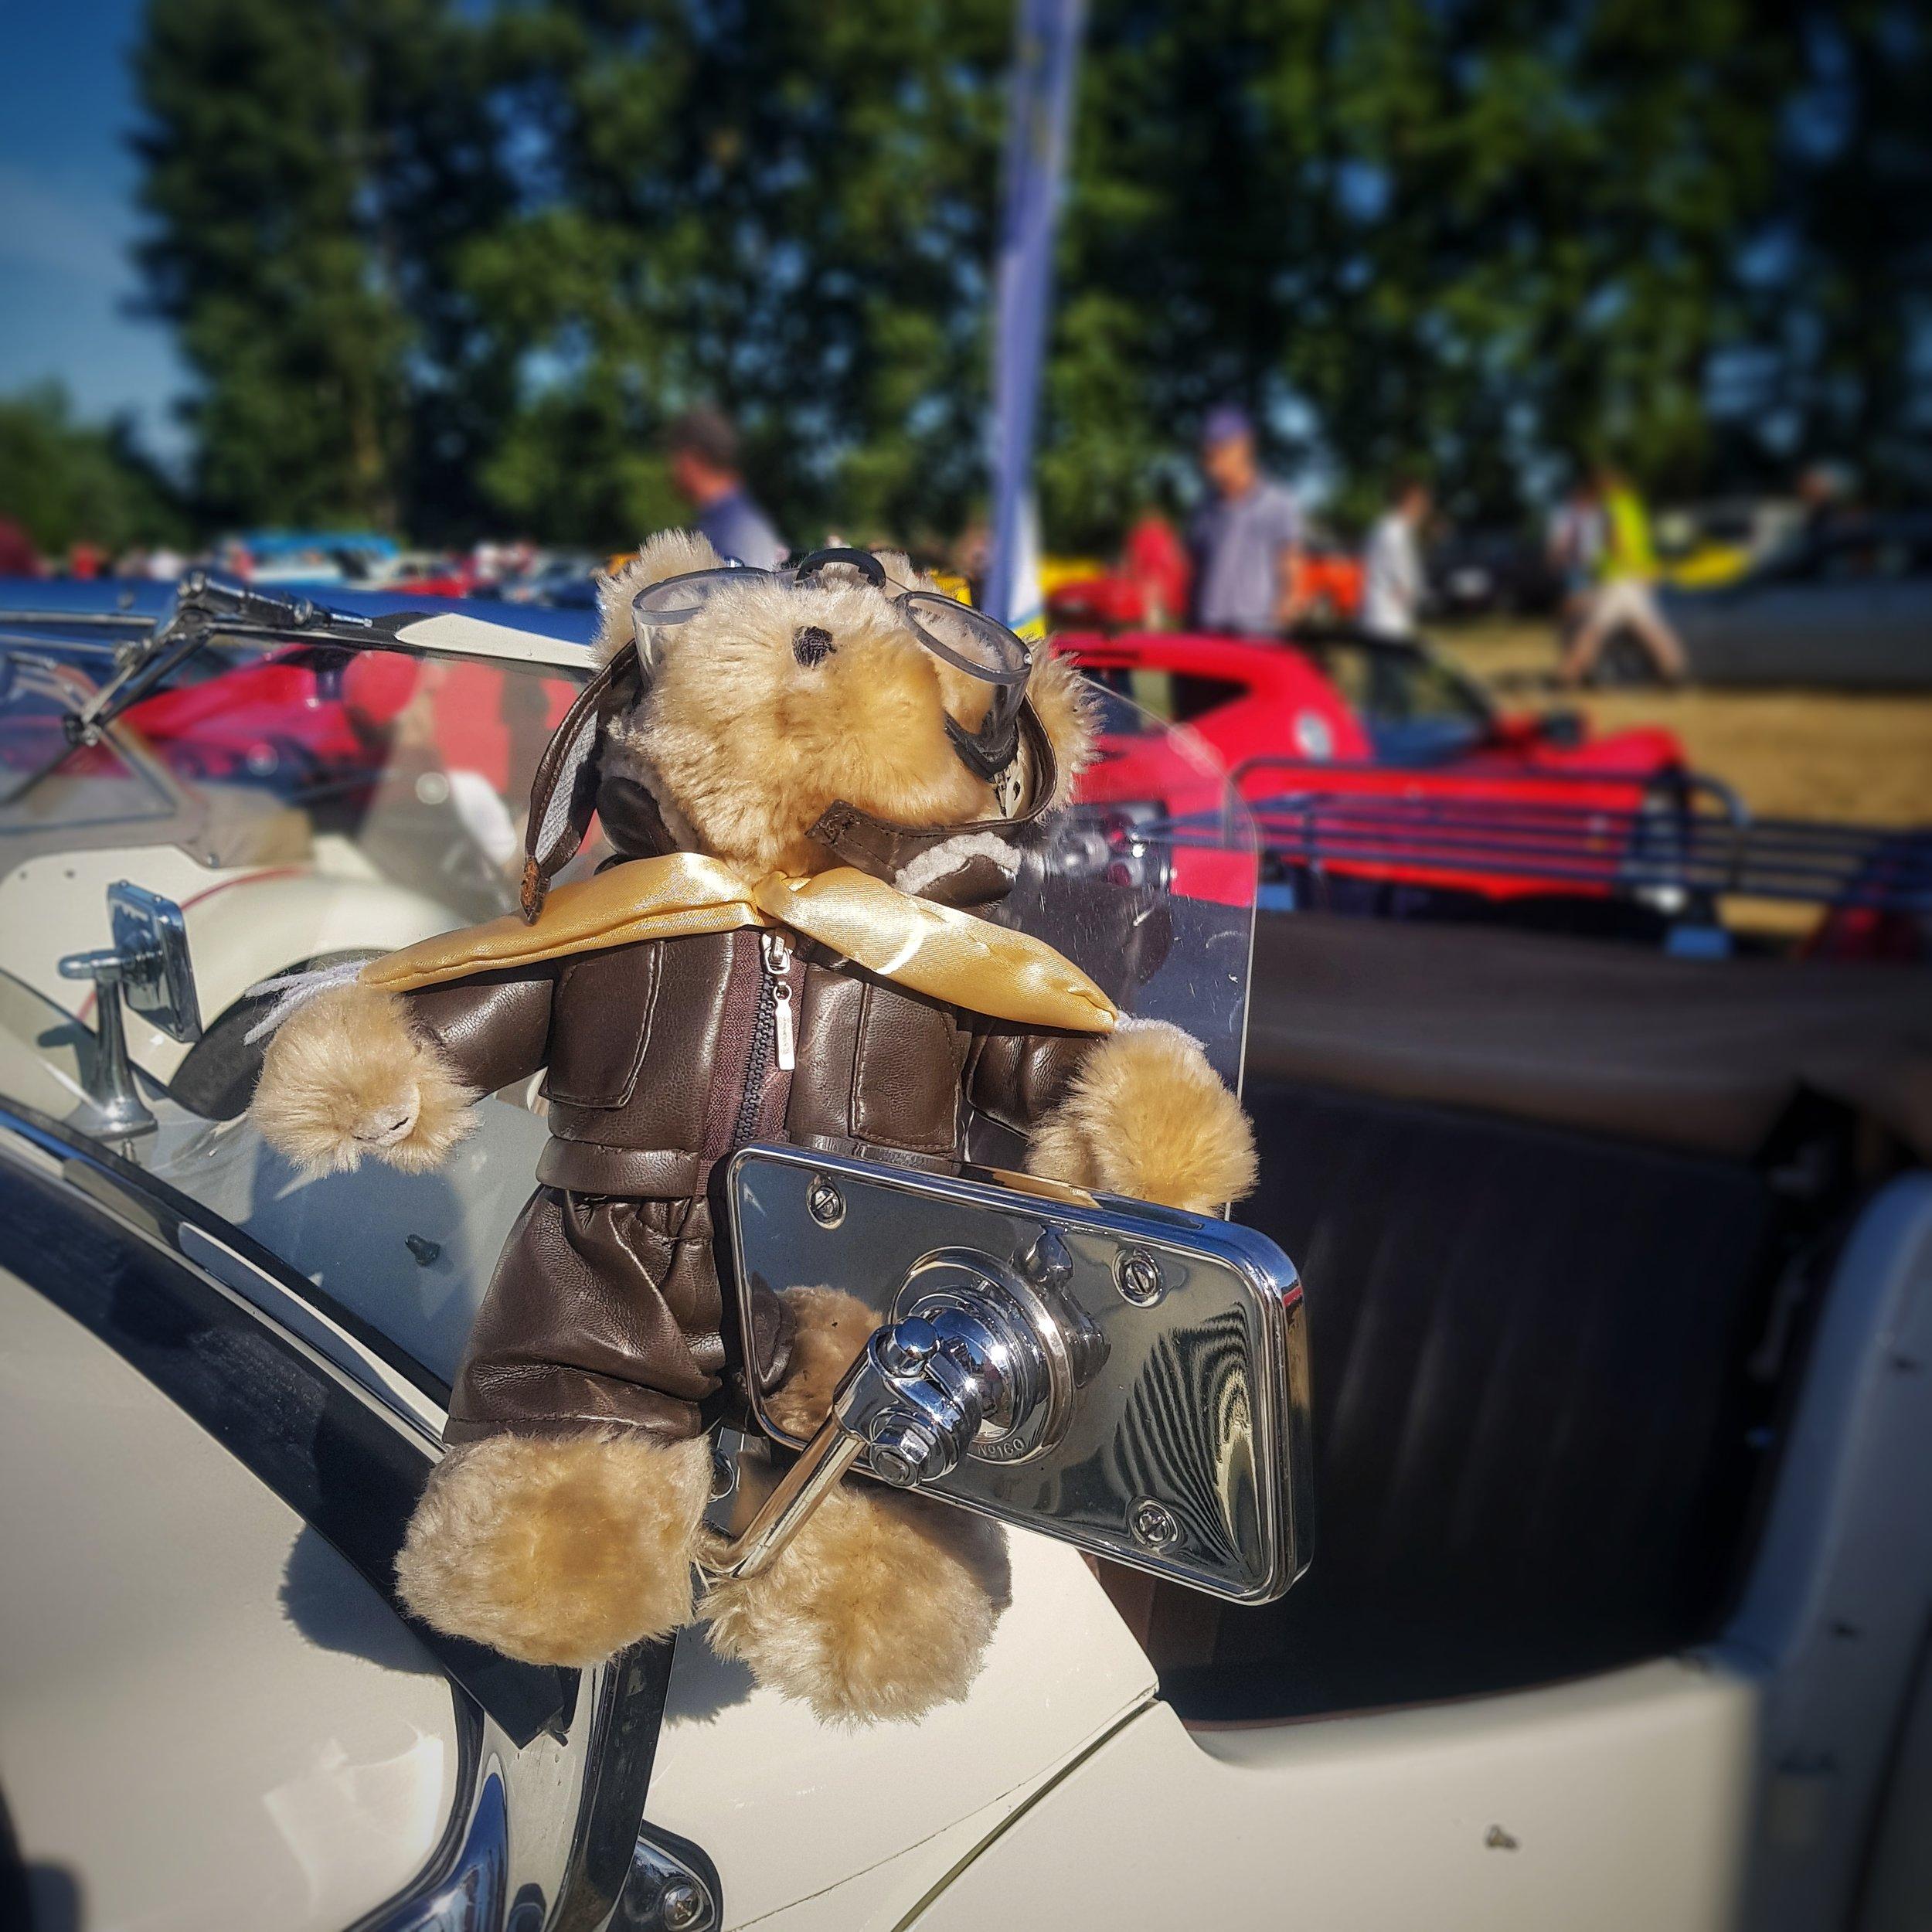 Day 156 - June 05: Teddy in a Triumph